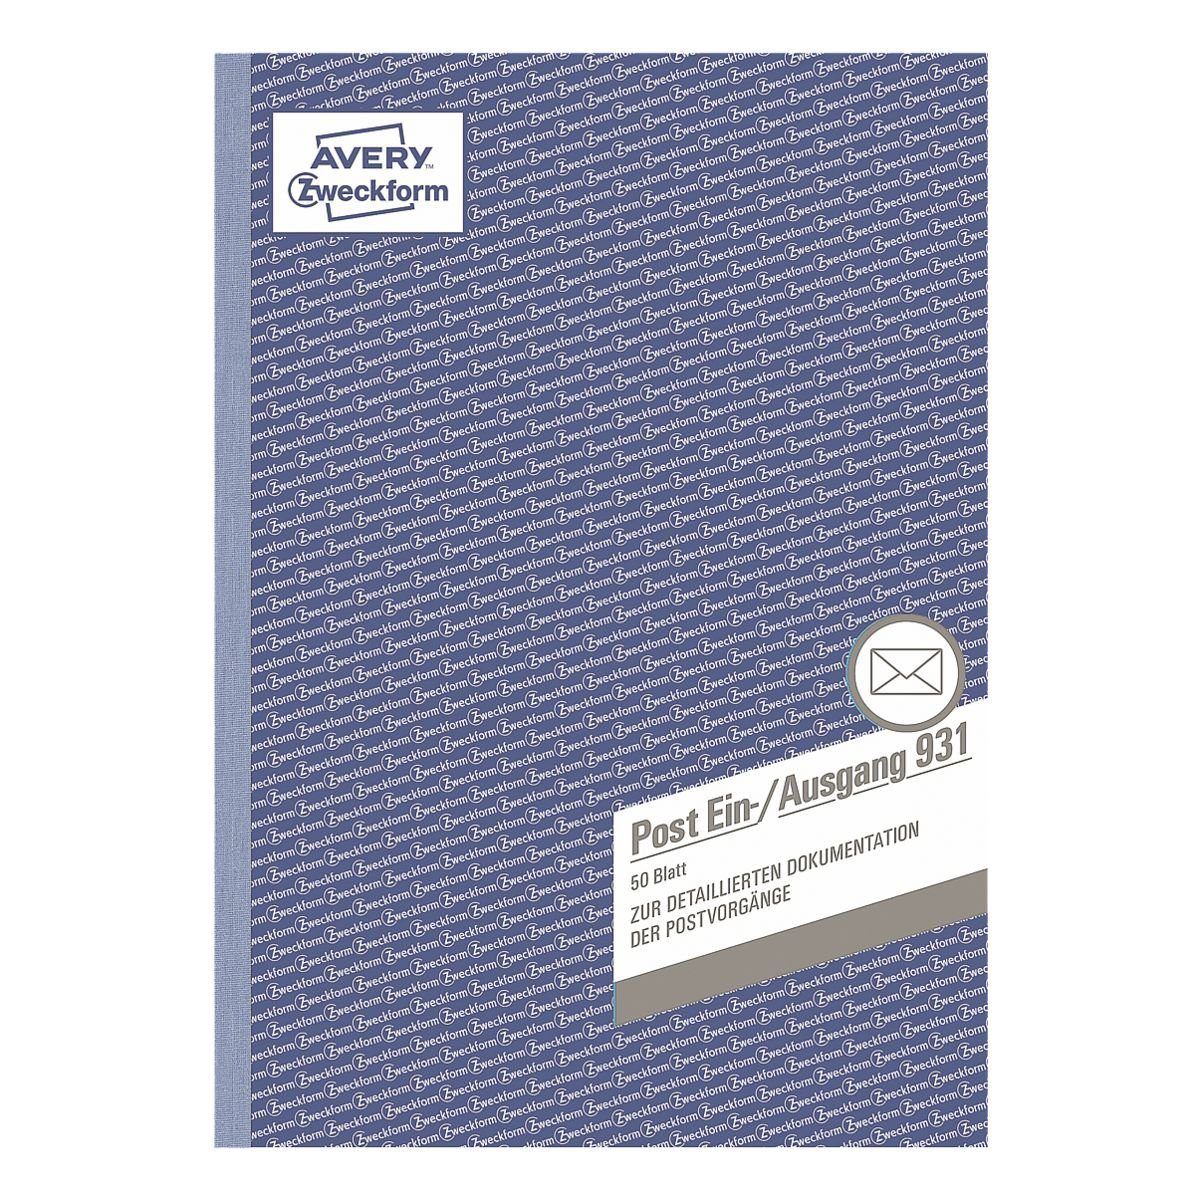 Avery Zweckform Formularbuch »Post-Ein-/Ausgangsbuch«